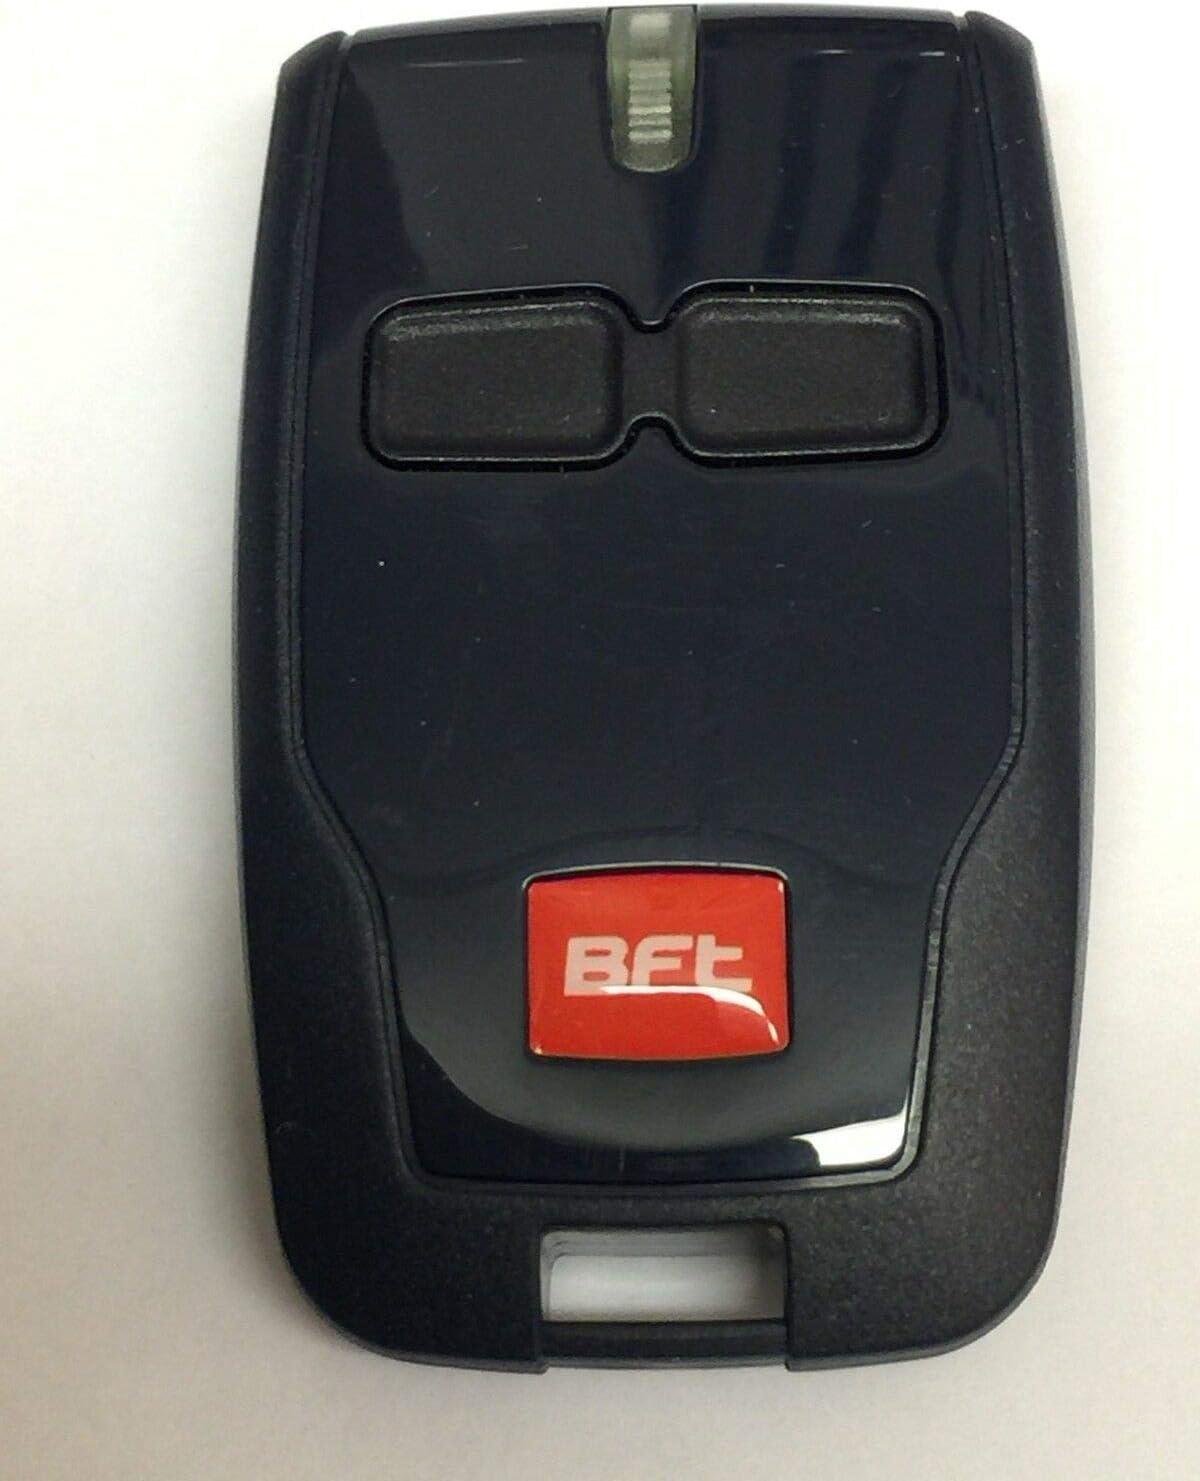 Mando BFT B RCB TX2